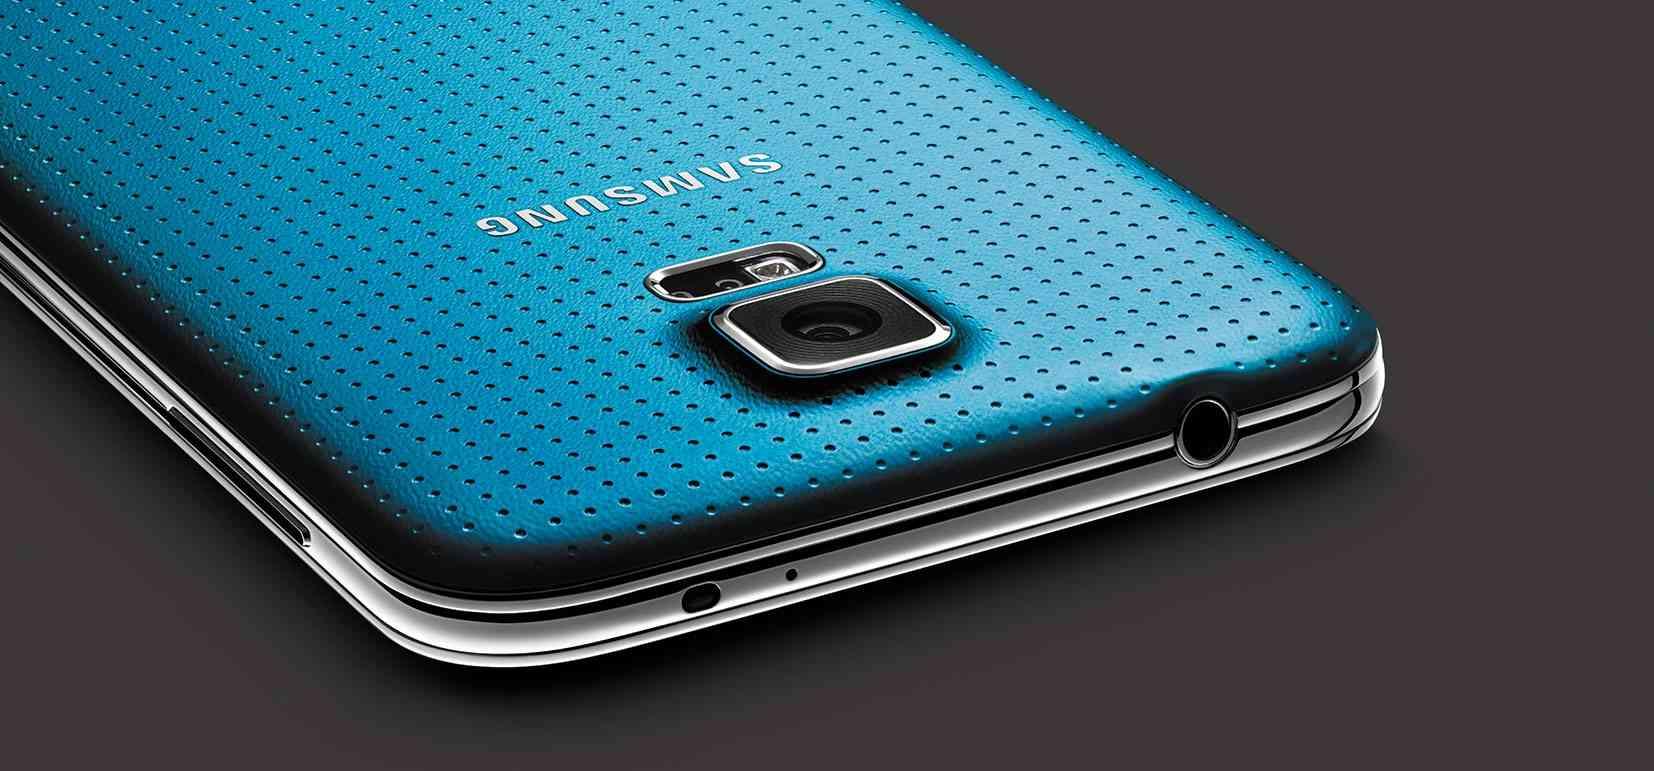 Glam_Galaxy-S5_Blue_Design